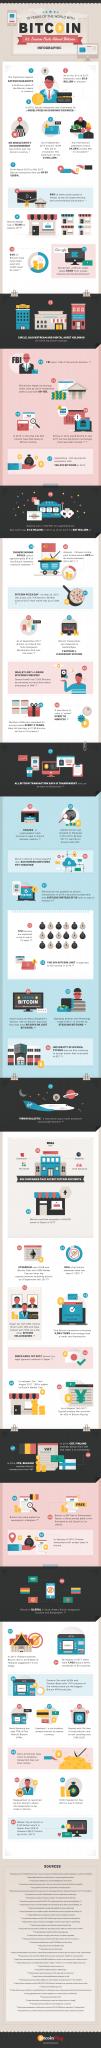 62 faits marquants à propos de Bitcoin